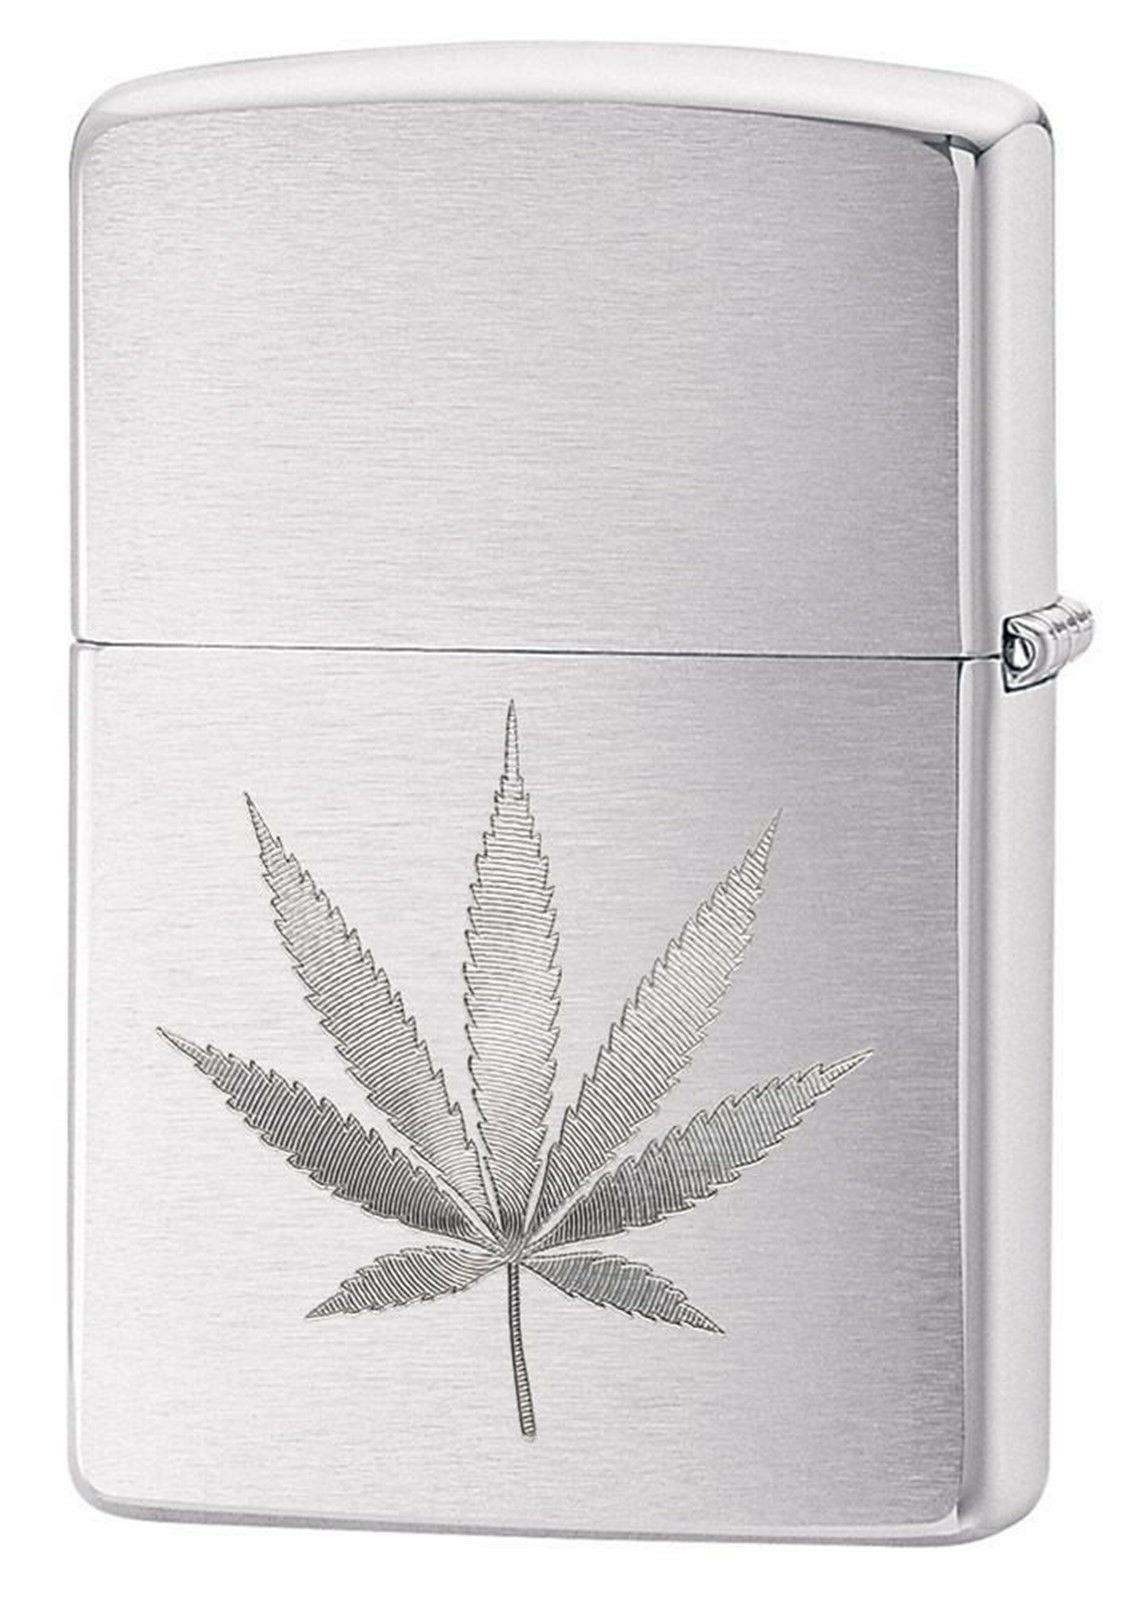 Zippo Lighter: Engraved Weed Leaf - Brushed Chrome 29587